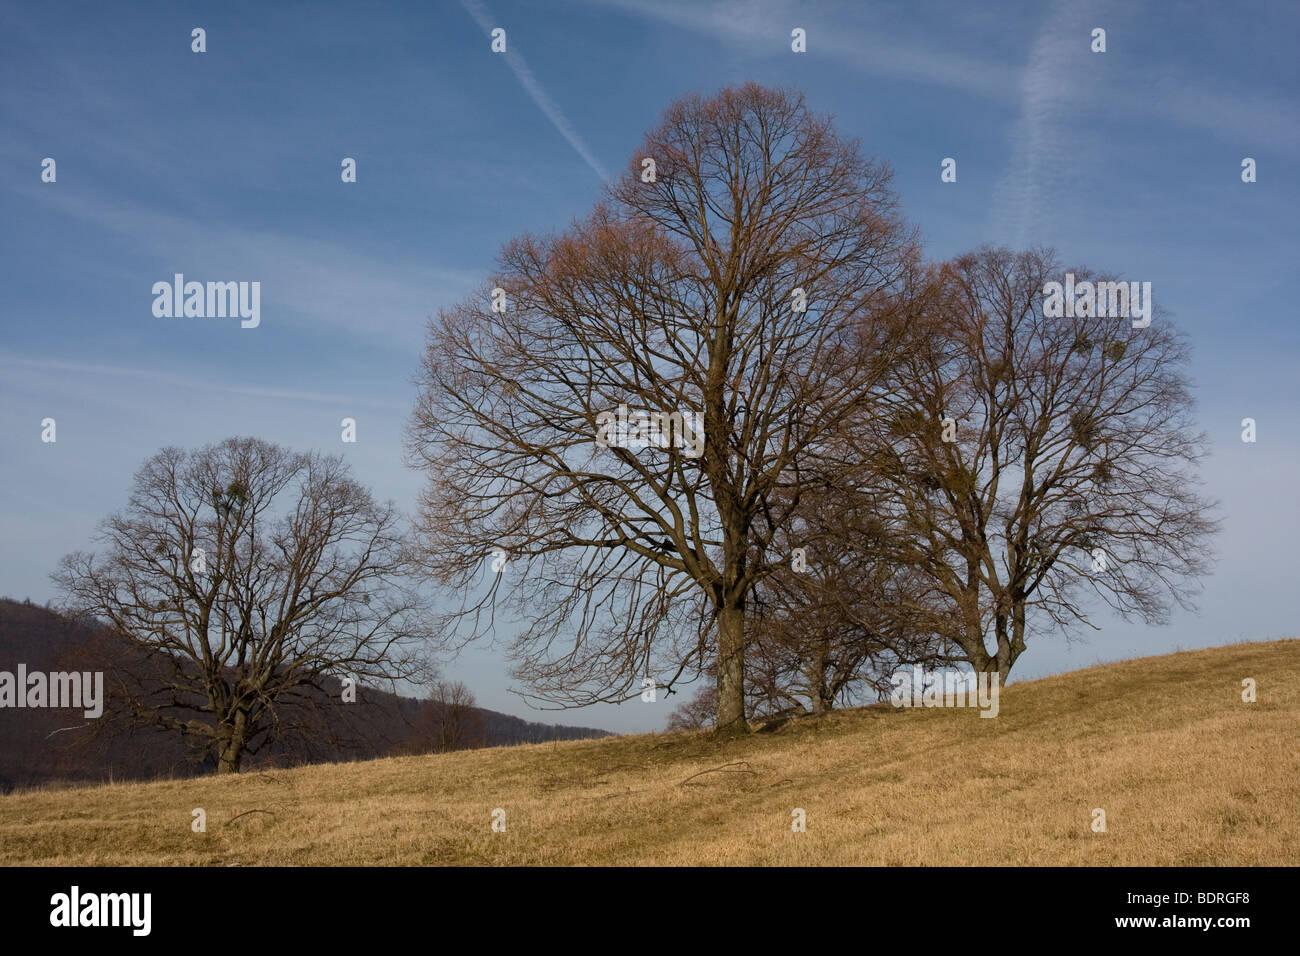 Baum, Baeume, Misteln, Fruehling, Teck, sch.ools.it Alb, Deutschland, Baum, Bäume, Misteln, Frühling, Stockbild